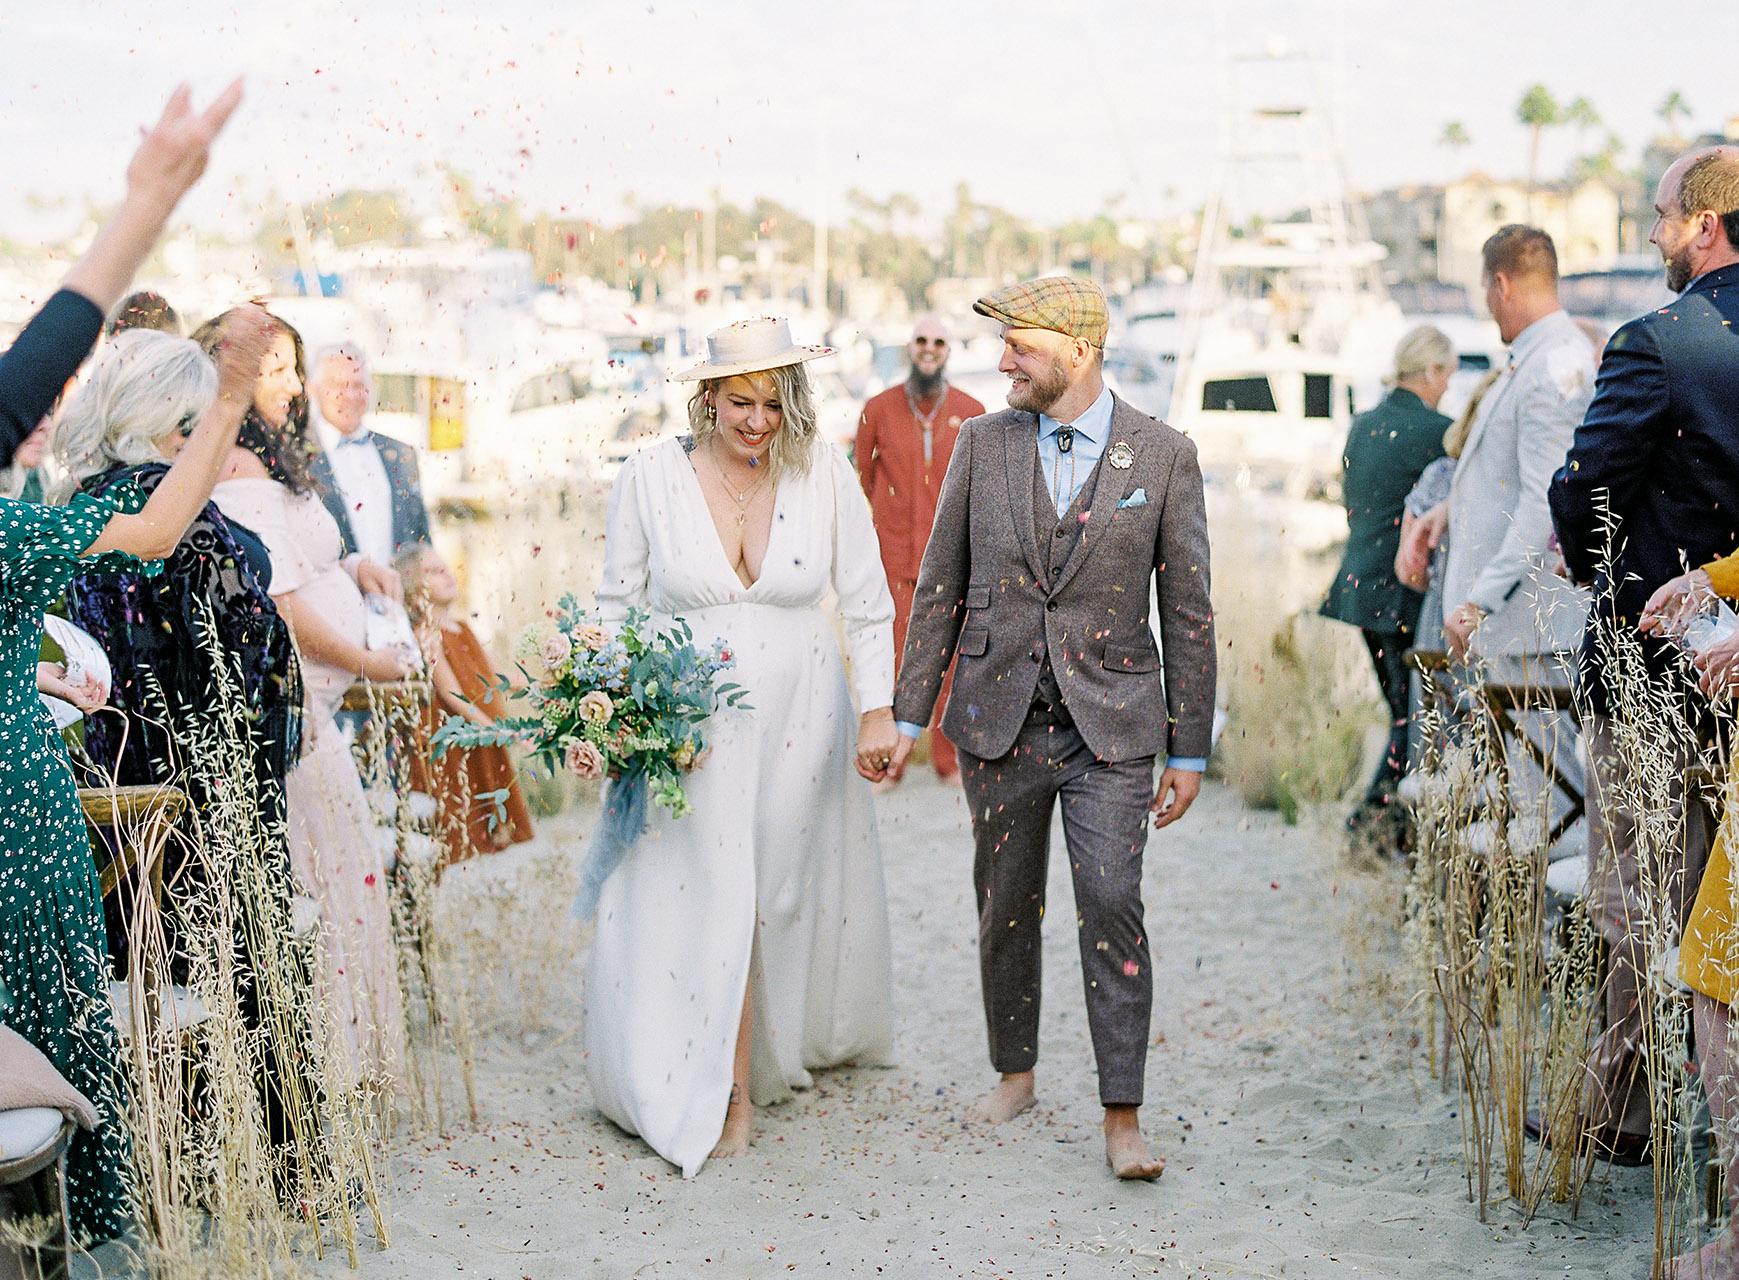 janelle stephen wedding ceremony recessional couple